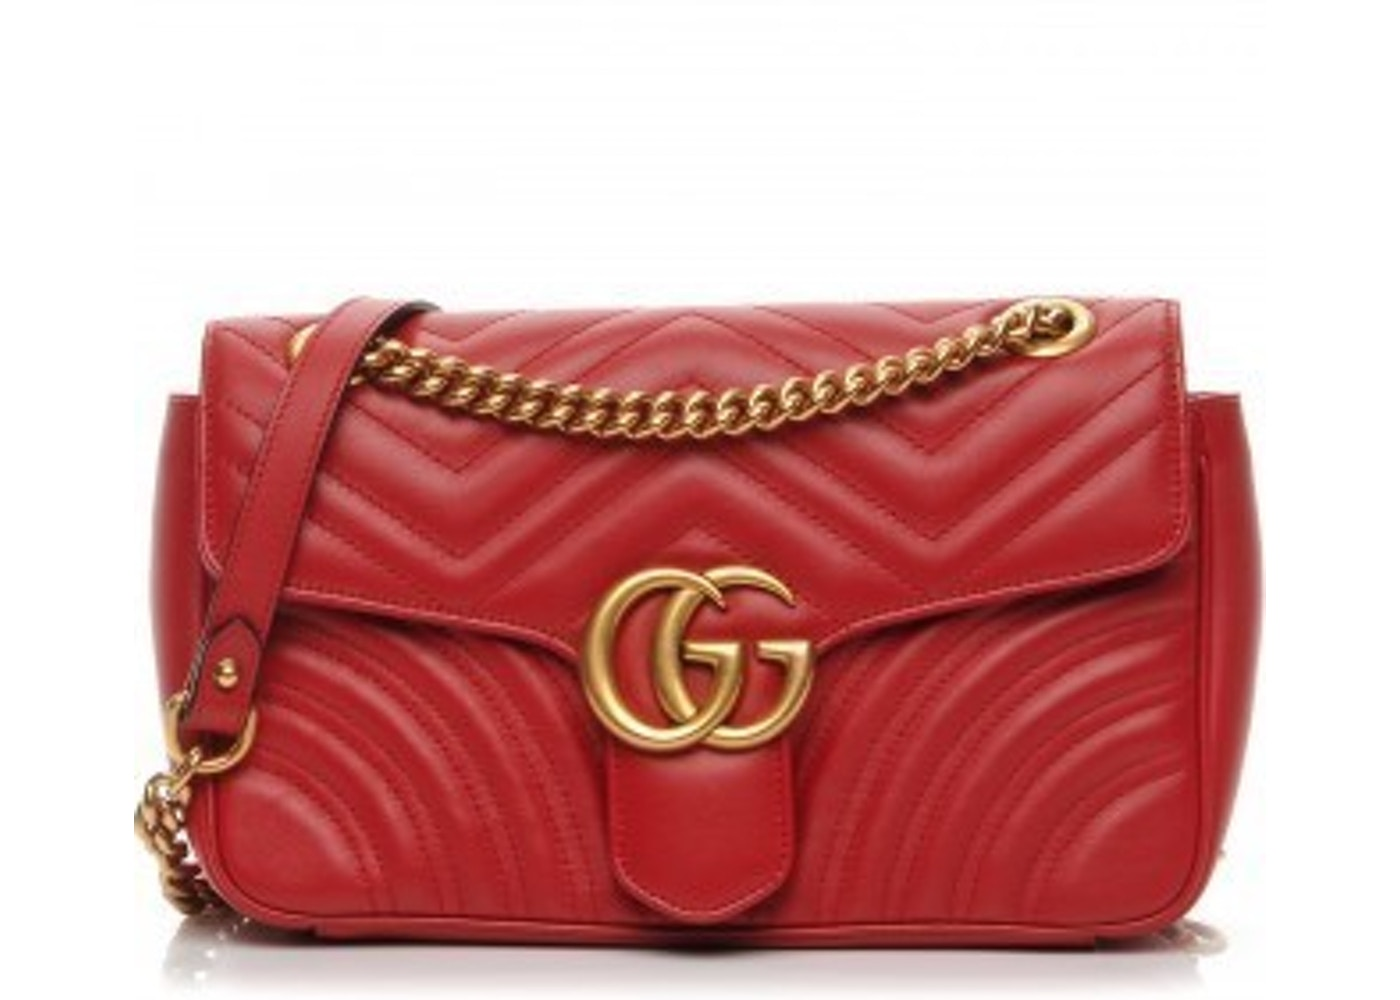 1c020d8e5720 Gucci Marmont Shoulder Bag Matelasse Small Hibiscus Red. Matelasse Small  Hibiscus Red